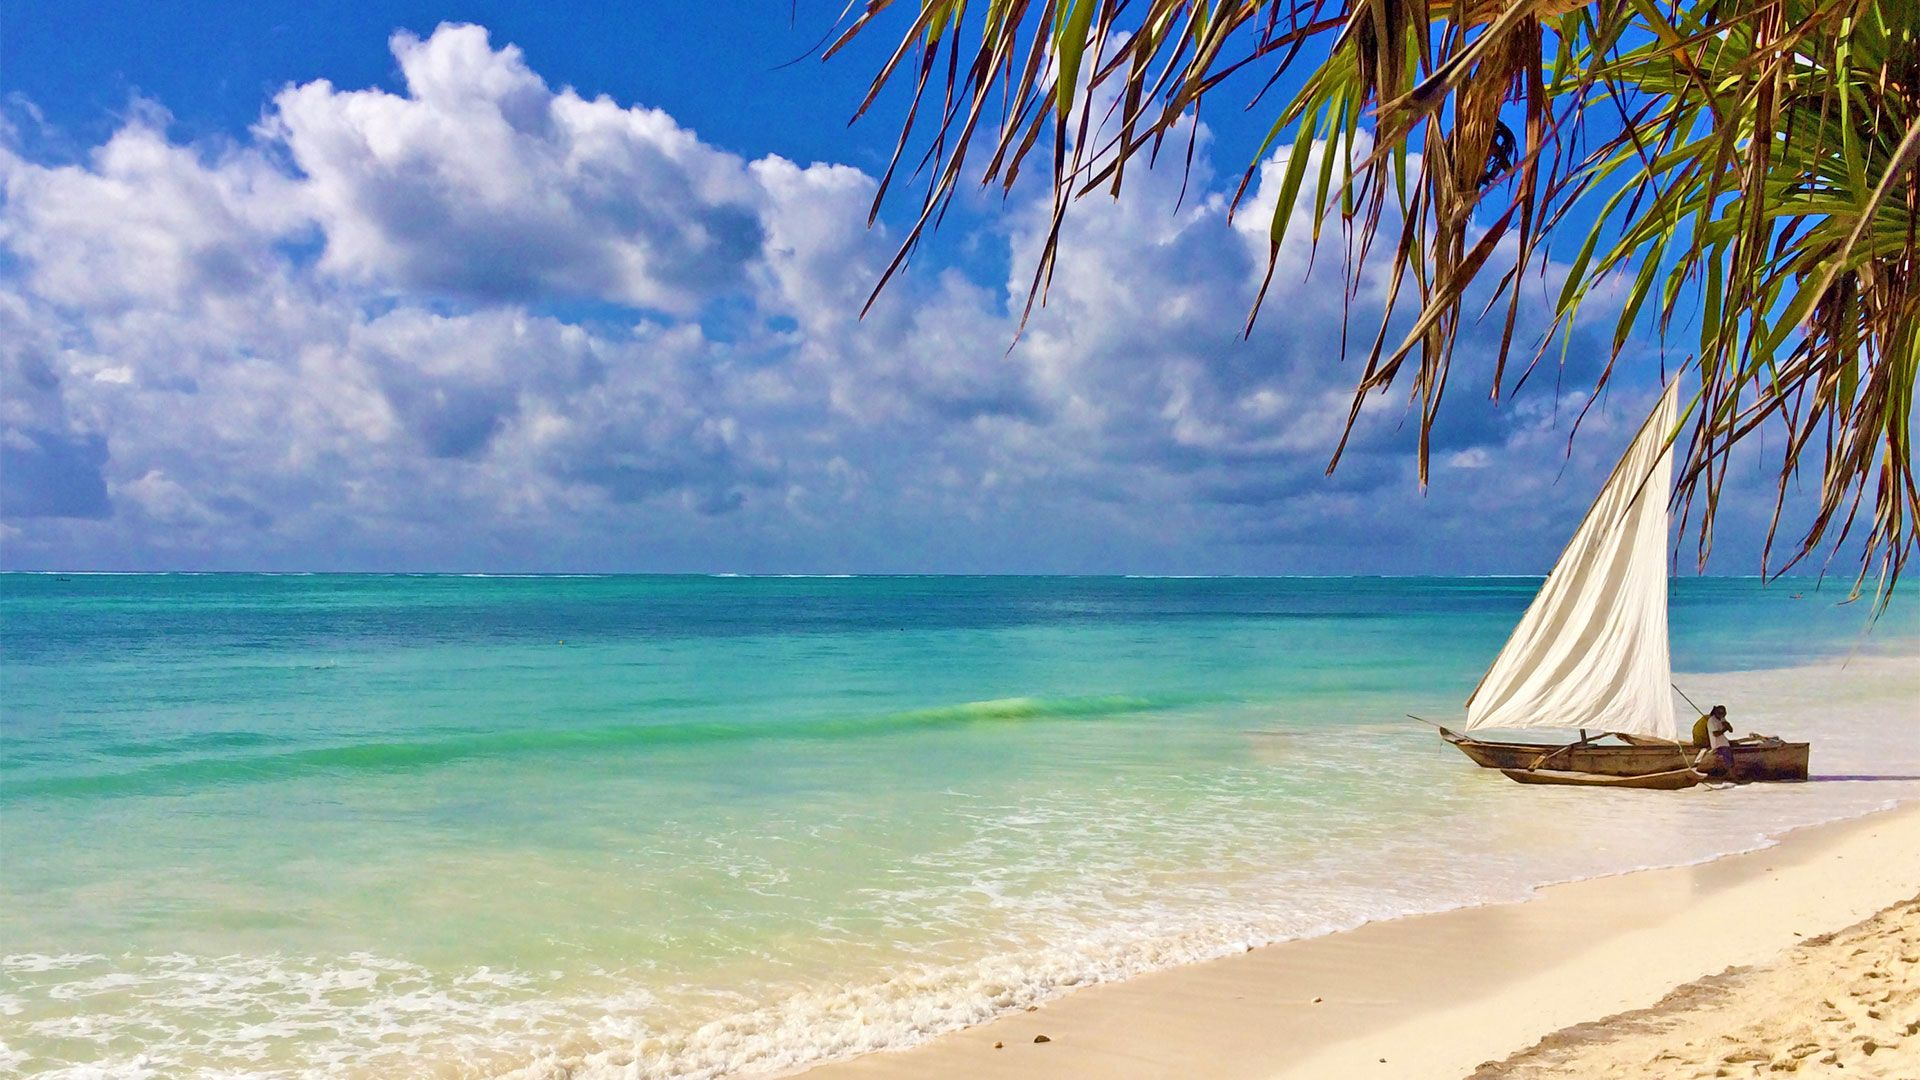 Revelion 2022 - Sejur plaja Zanzibar, 12 zile - 29 decembrie 2021